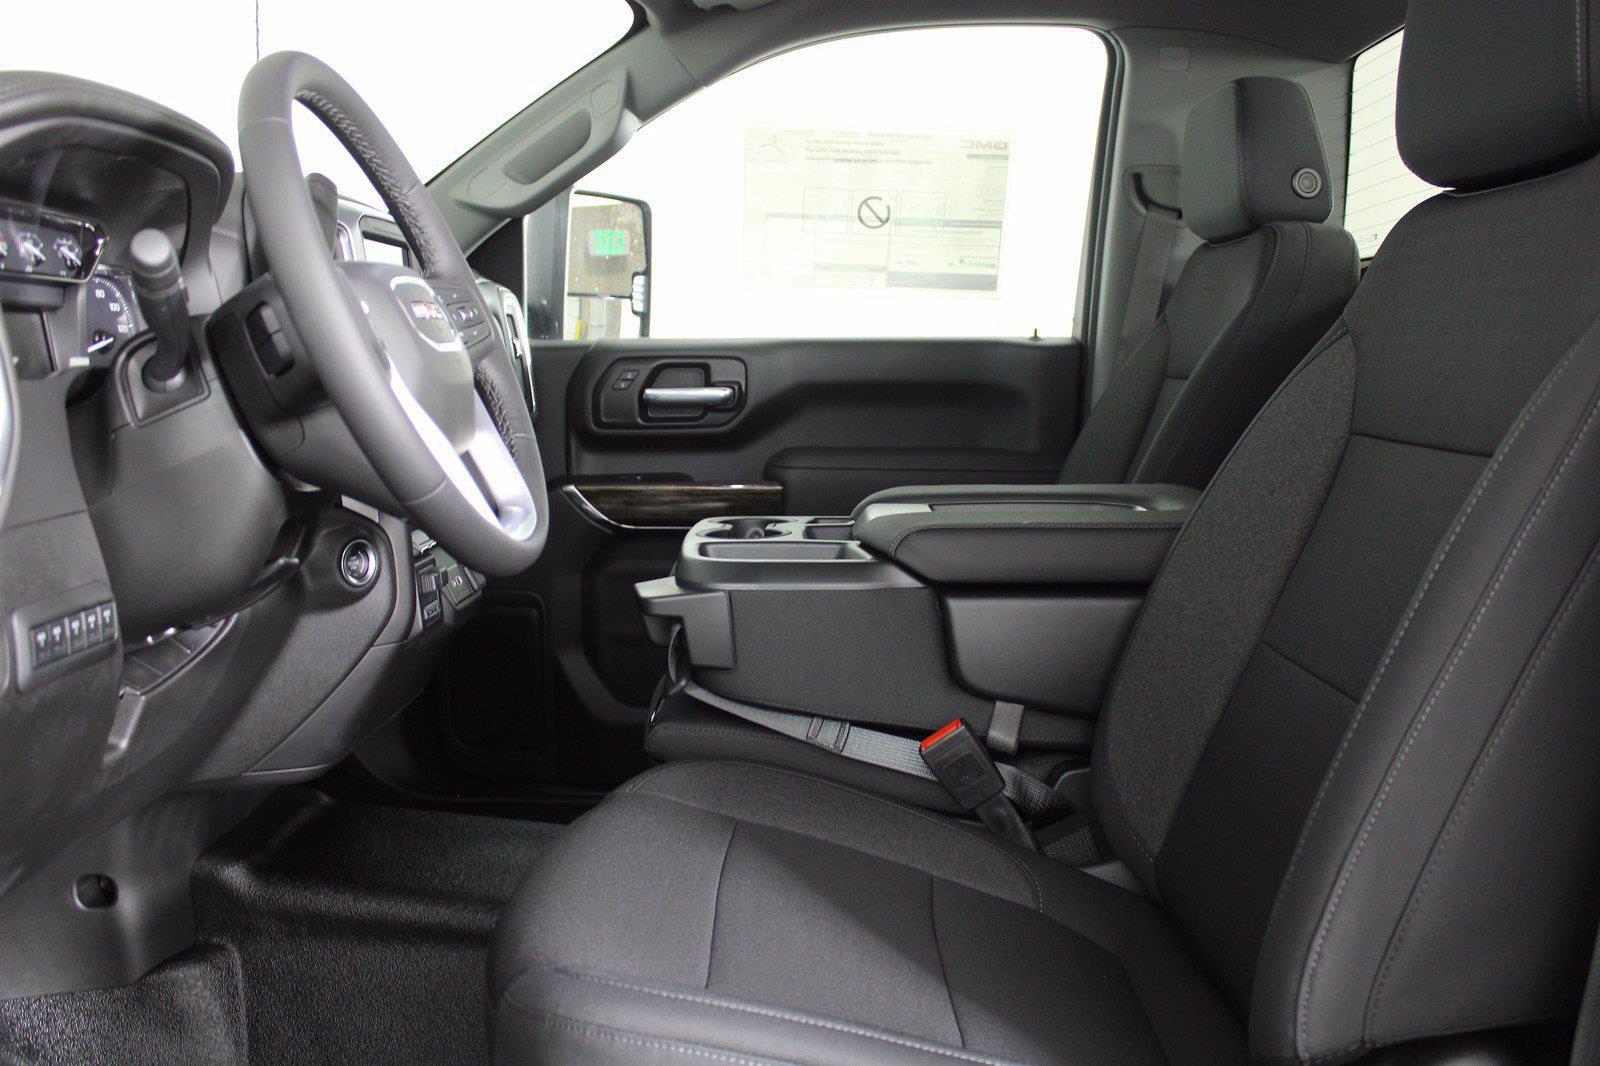 2022 Sierra 2500 Regular Cab 4x4,  Pickup #D420026 - photo 15